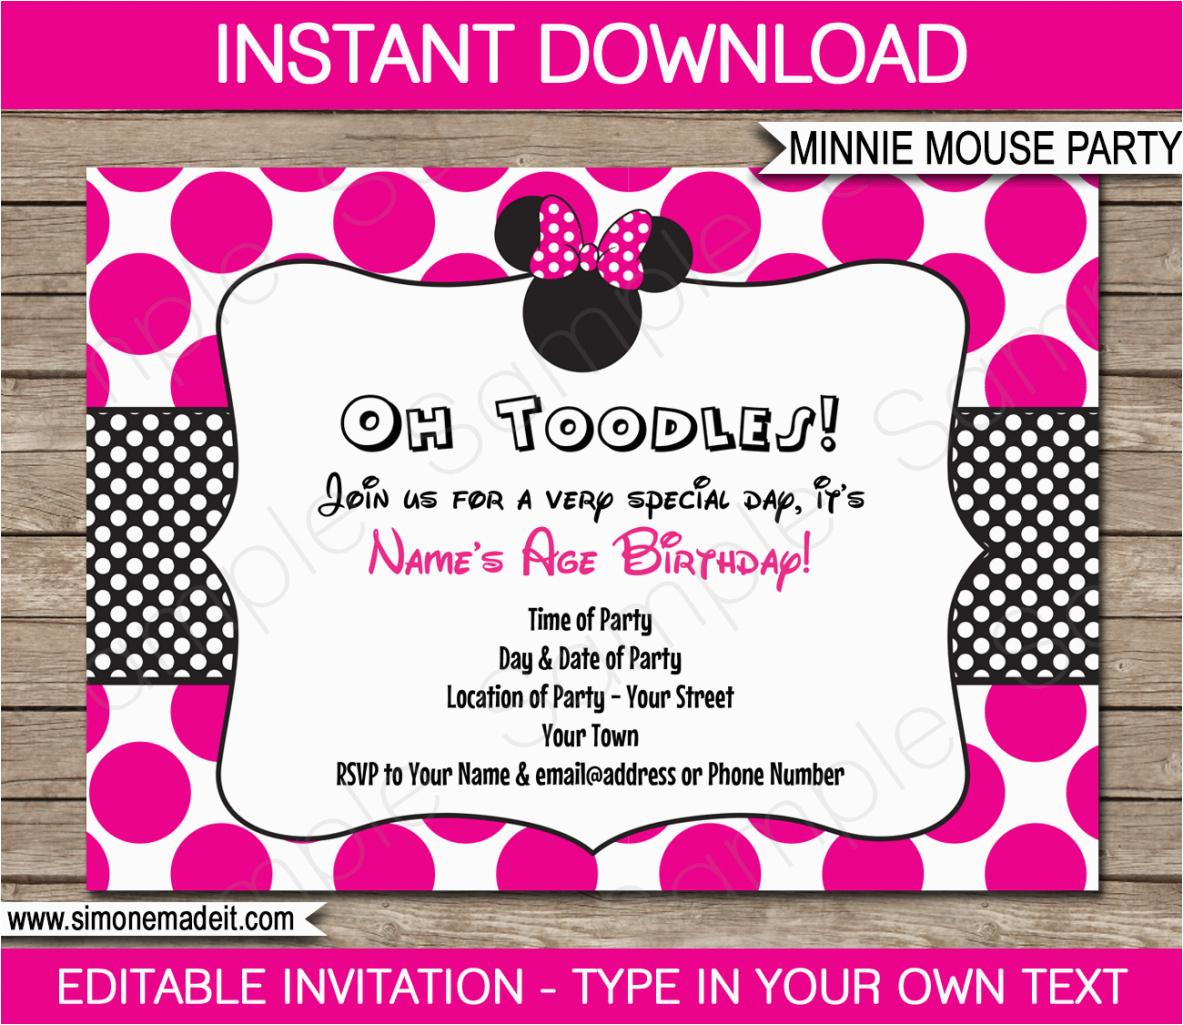 Create Minnie Mouse Birthday Invitations | Birthdaybuzz - Free Printable Minnie Mouse Party Invitations